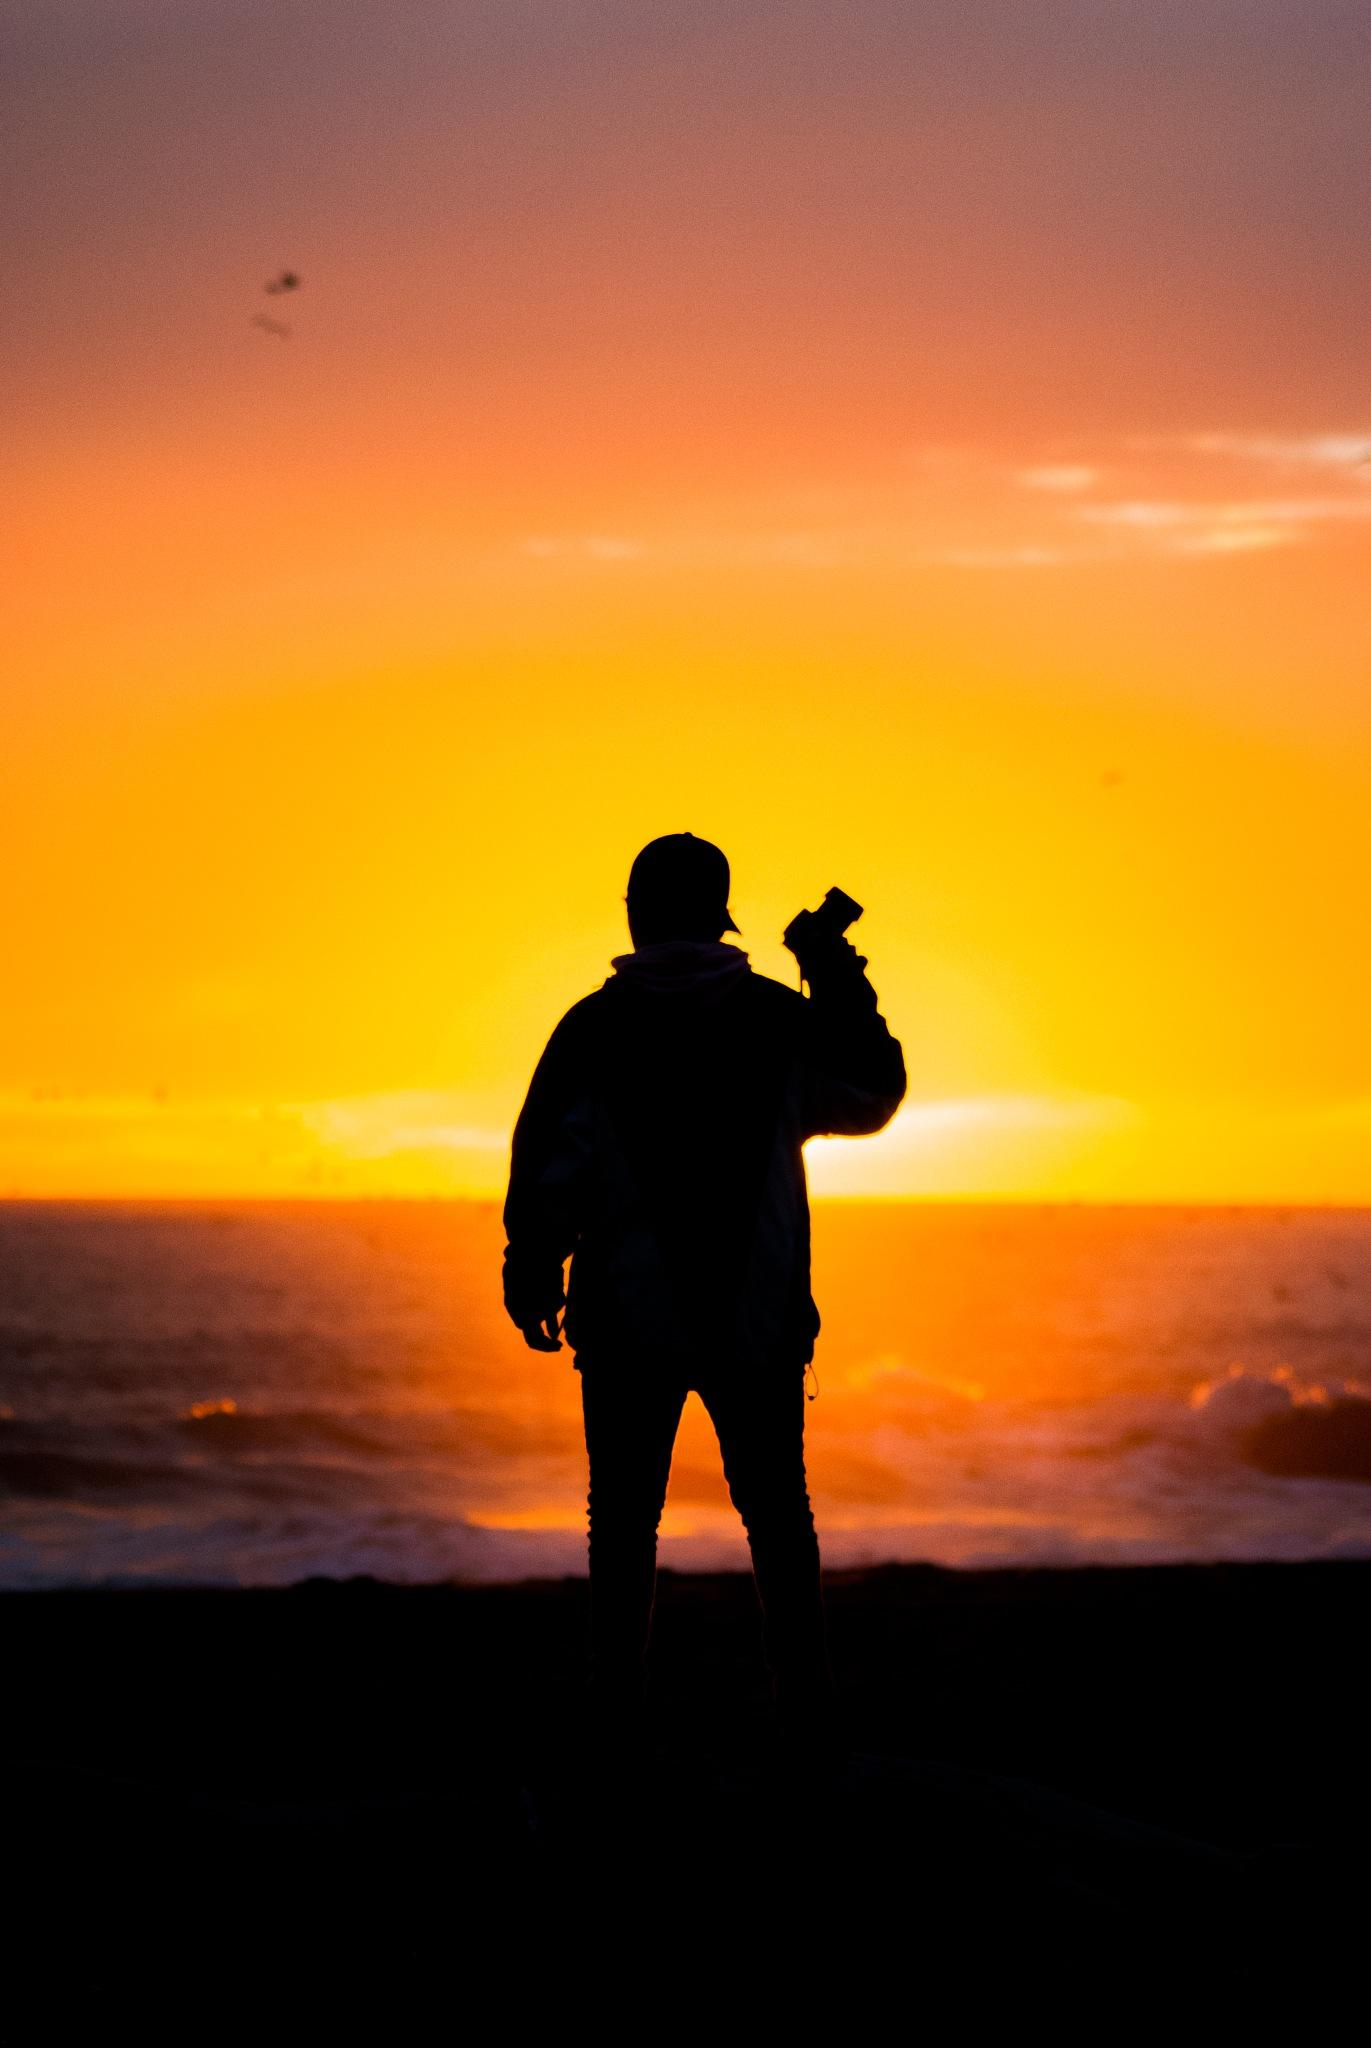 Sunset silhouette  by Gustavo Rosas Pinochet